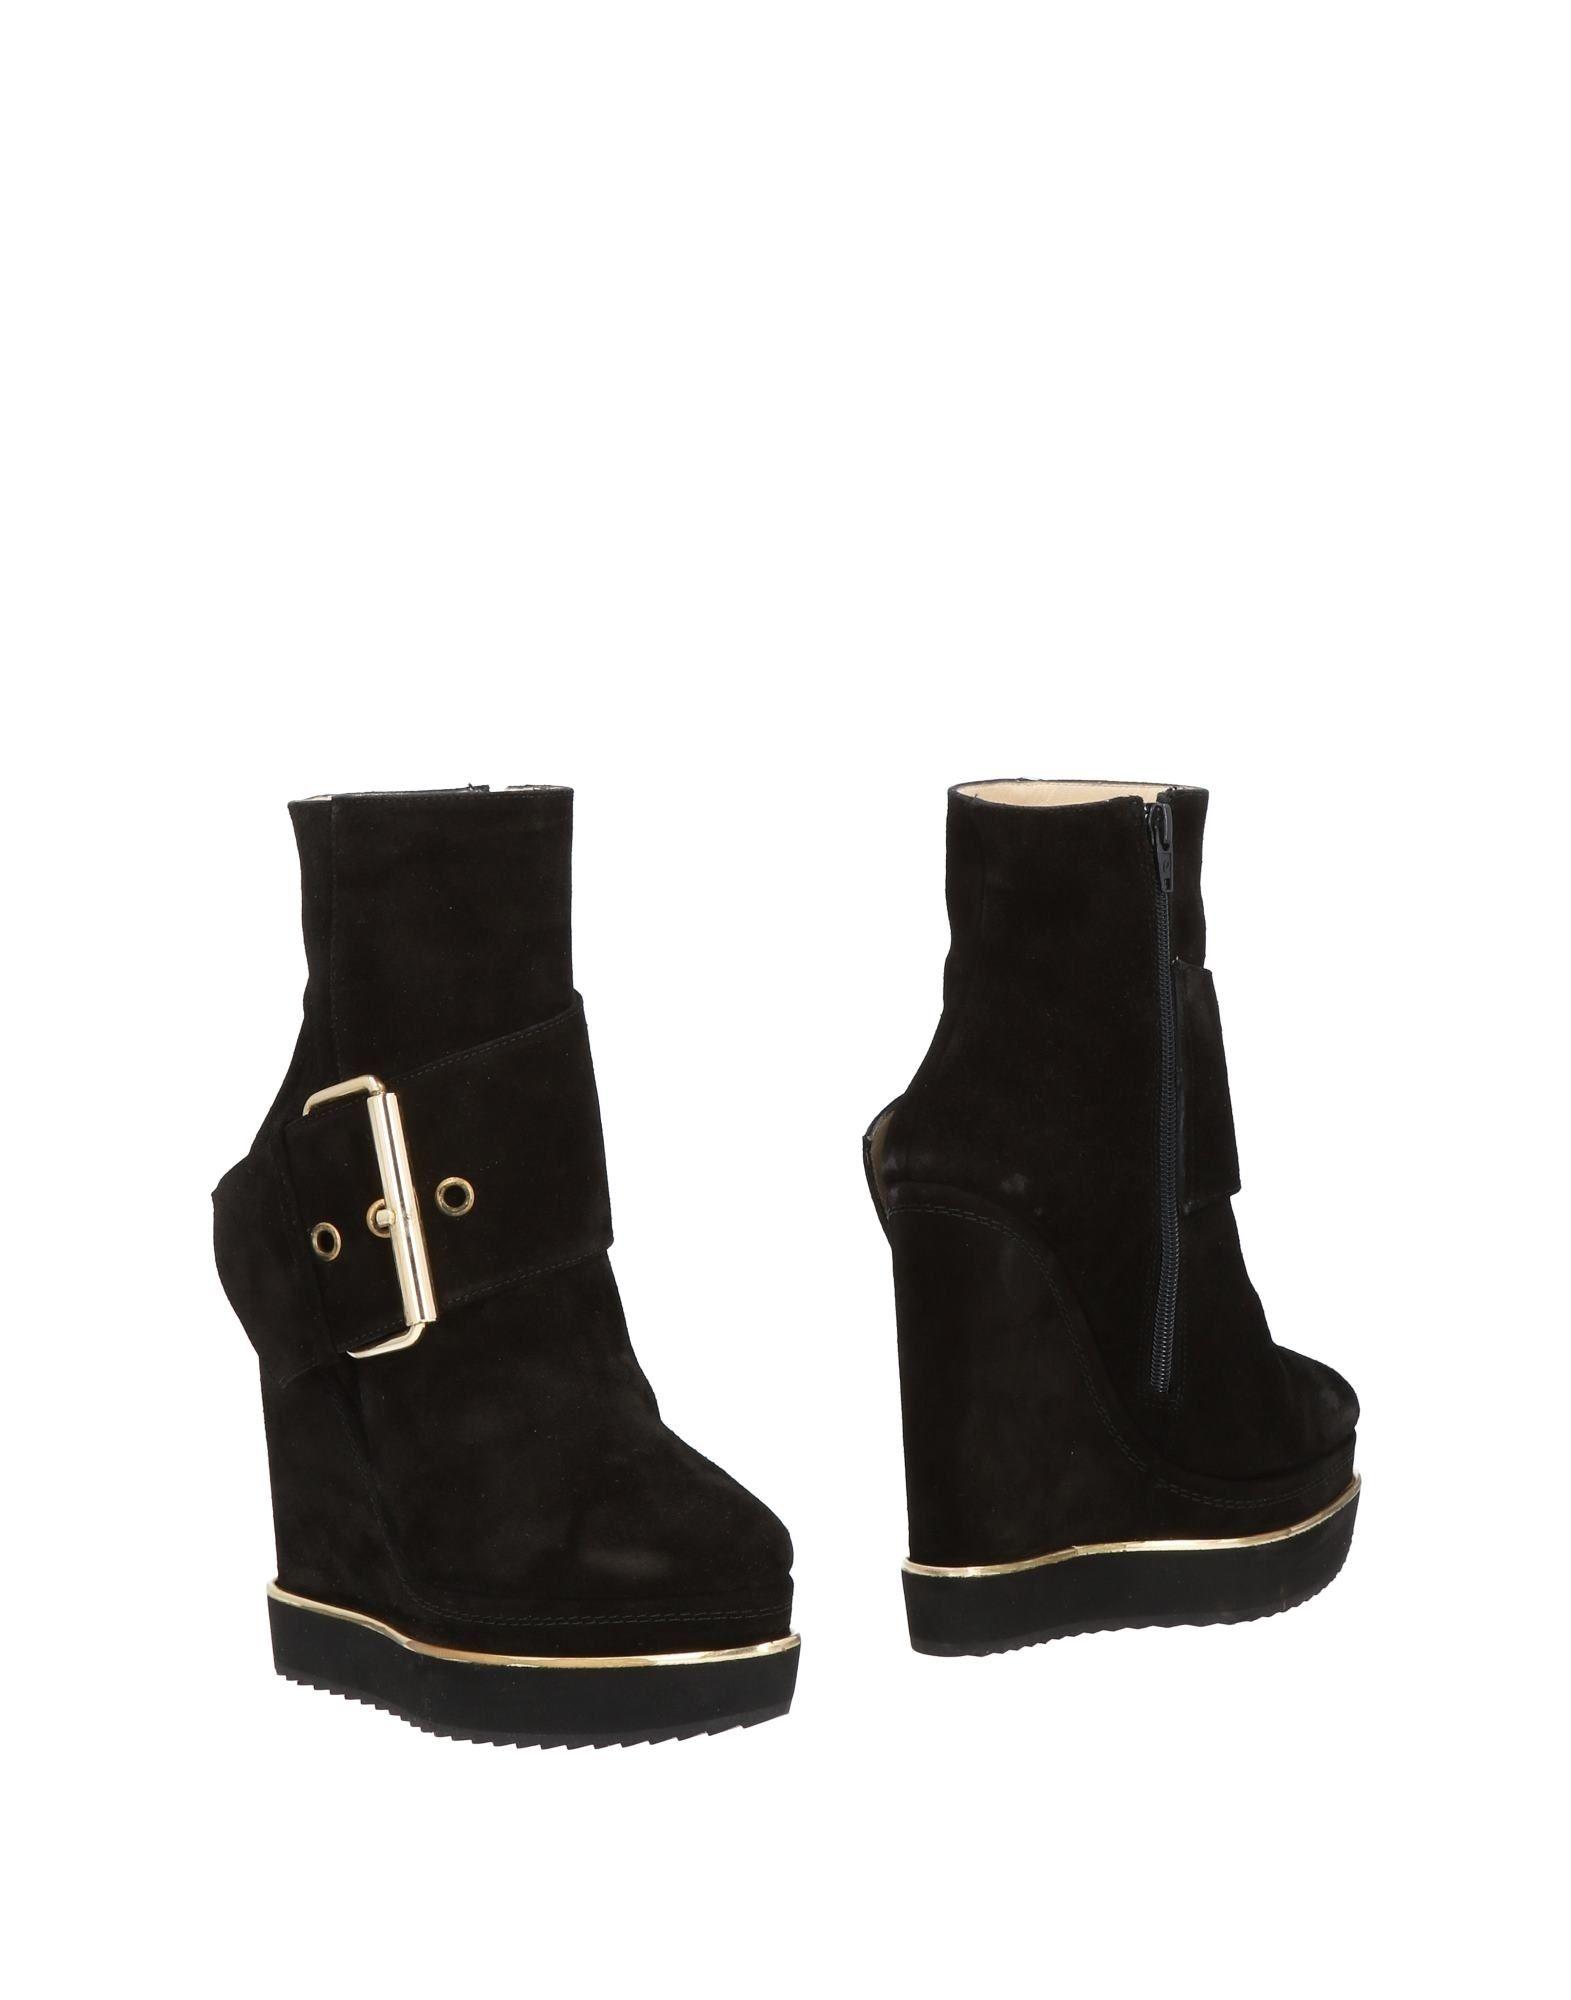 Paloma Barceló Stiefelette 11501174CG Damen  11501174CG Stiefelette Neue Schuhe 8f8706